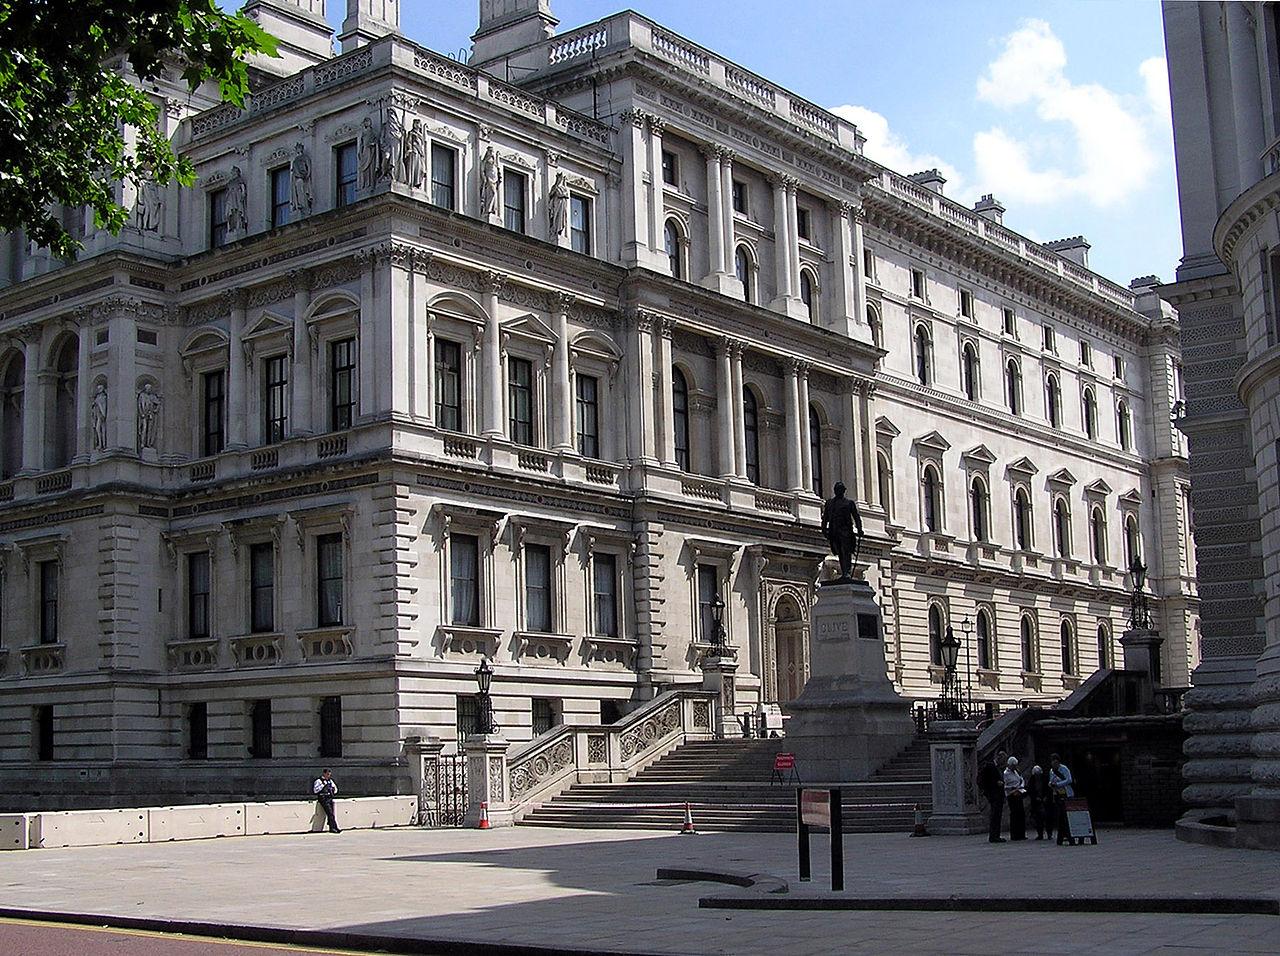 Photo: ロンドンのイギリス外務省  Photo from Wikimedia Commons (public domain). http://commons.wikimedia.org/wiki/File:Foreign.office.london.arp.jpg  『ロシア・ハウス』 http://goo.gl/YR7k9d 『シャーロック・ホームズの冒険 第二の血痕』 http://goo.gl/y0y80s